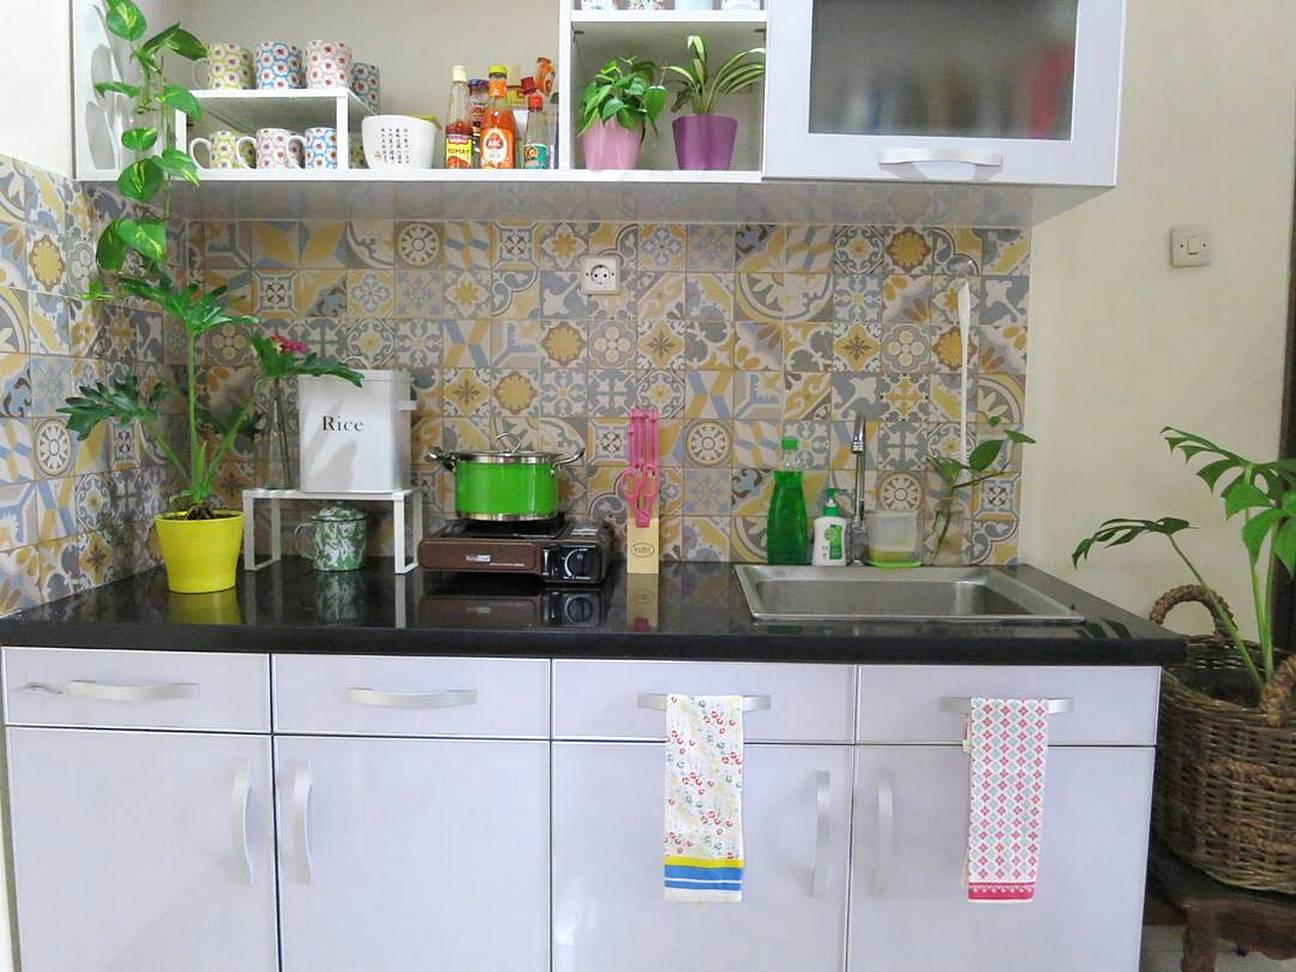 Warna Keramik Lantai Yang Cantik Desain Rumah Minimalis